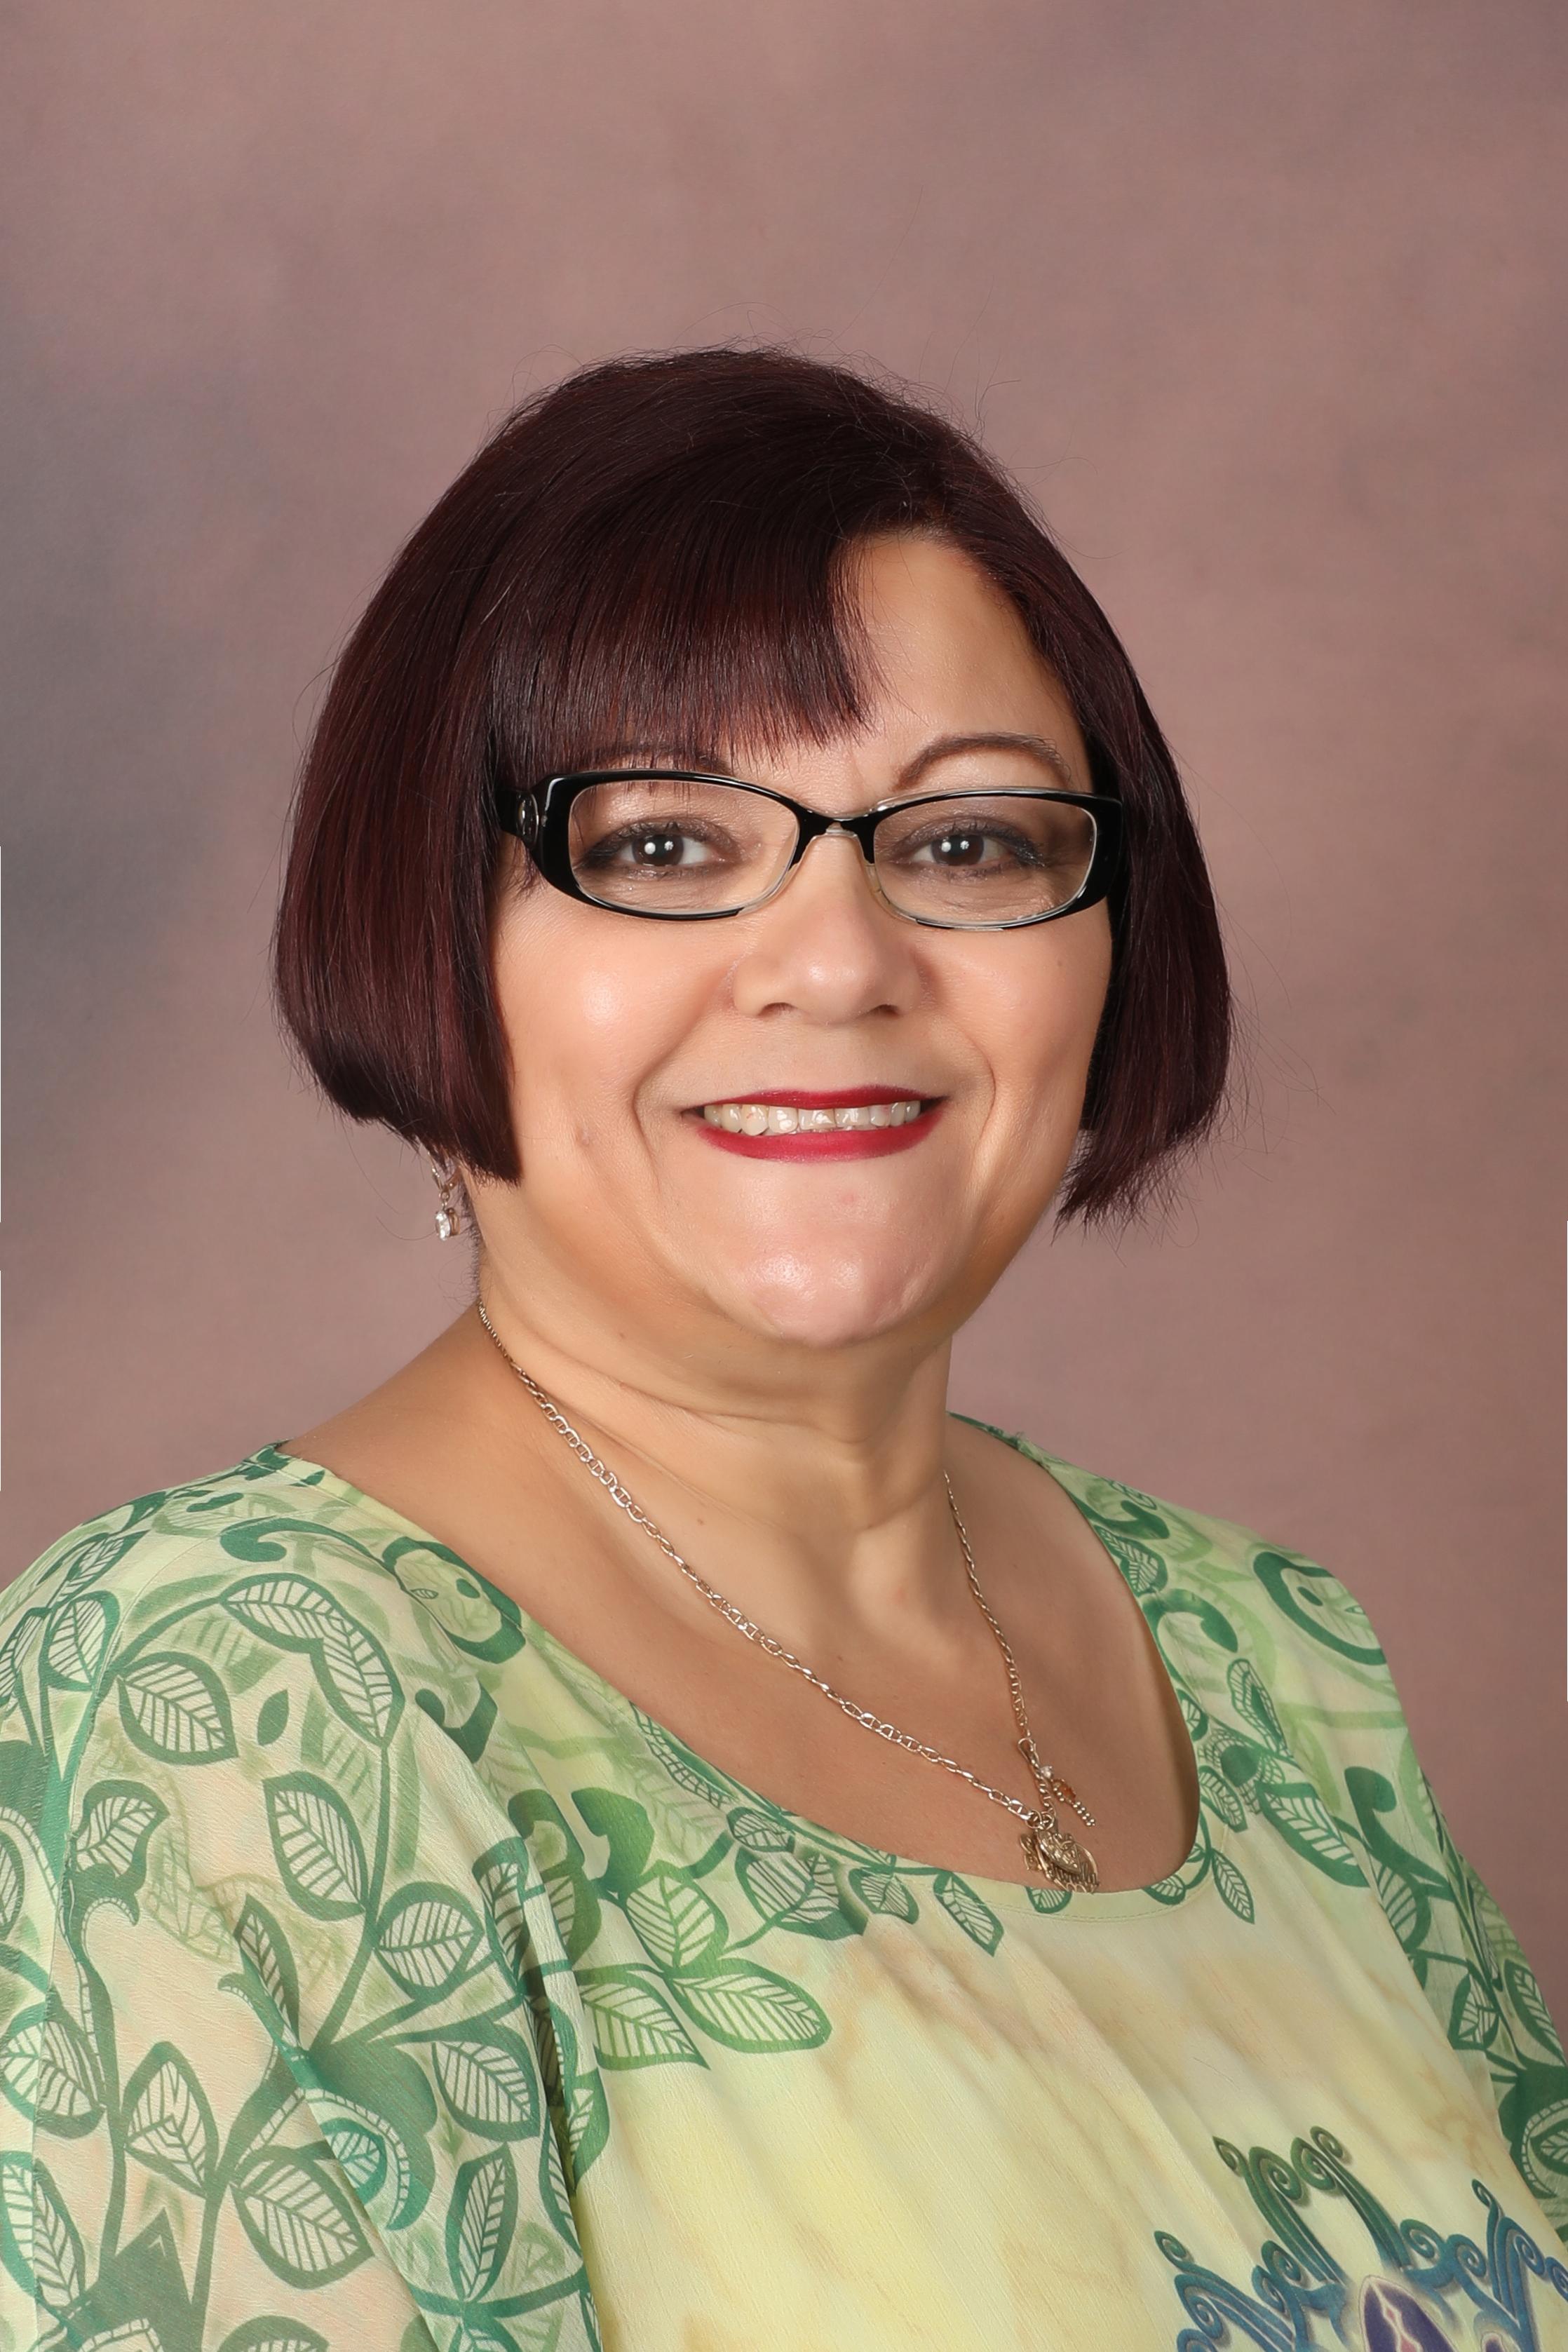 Minister Toñita Herring